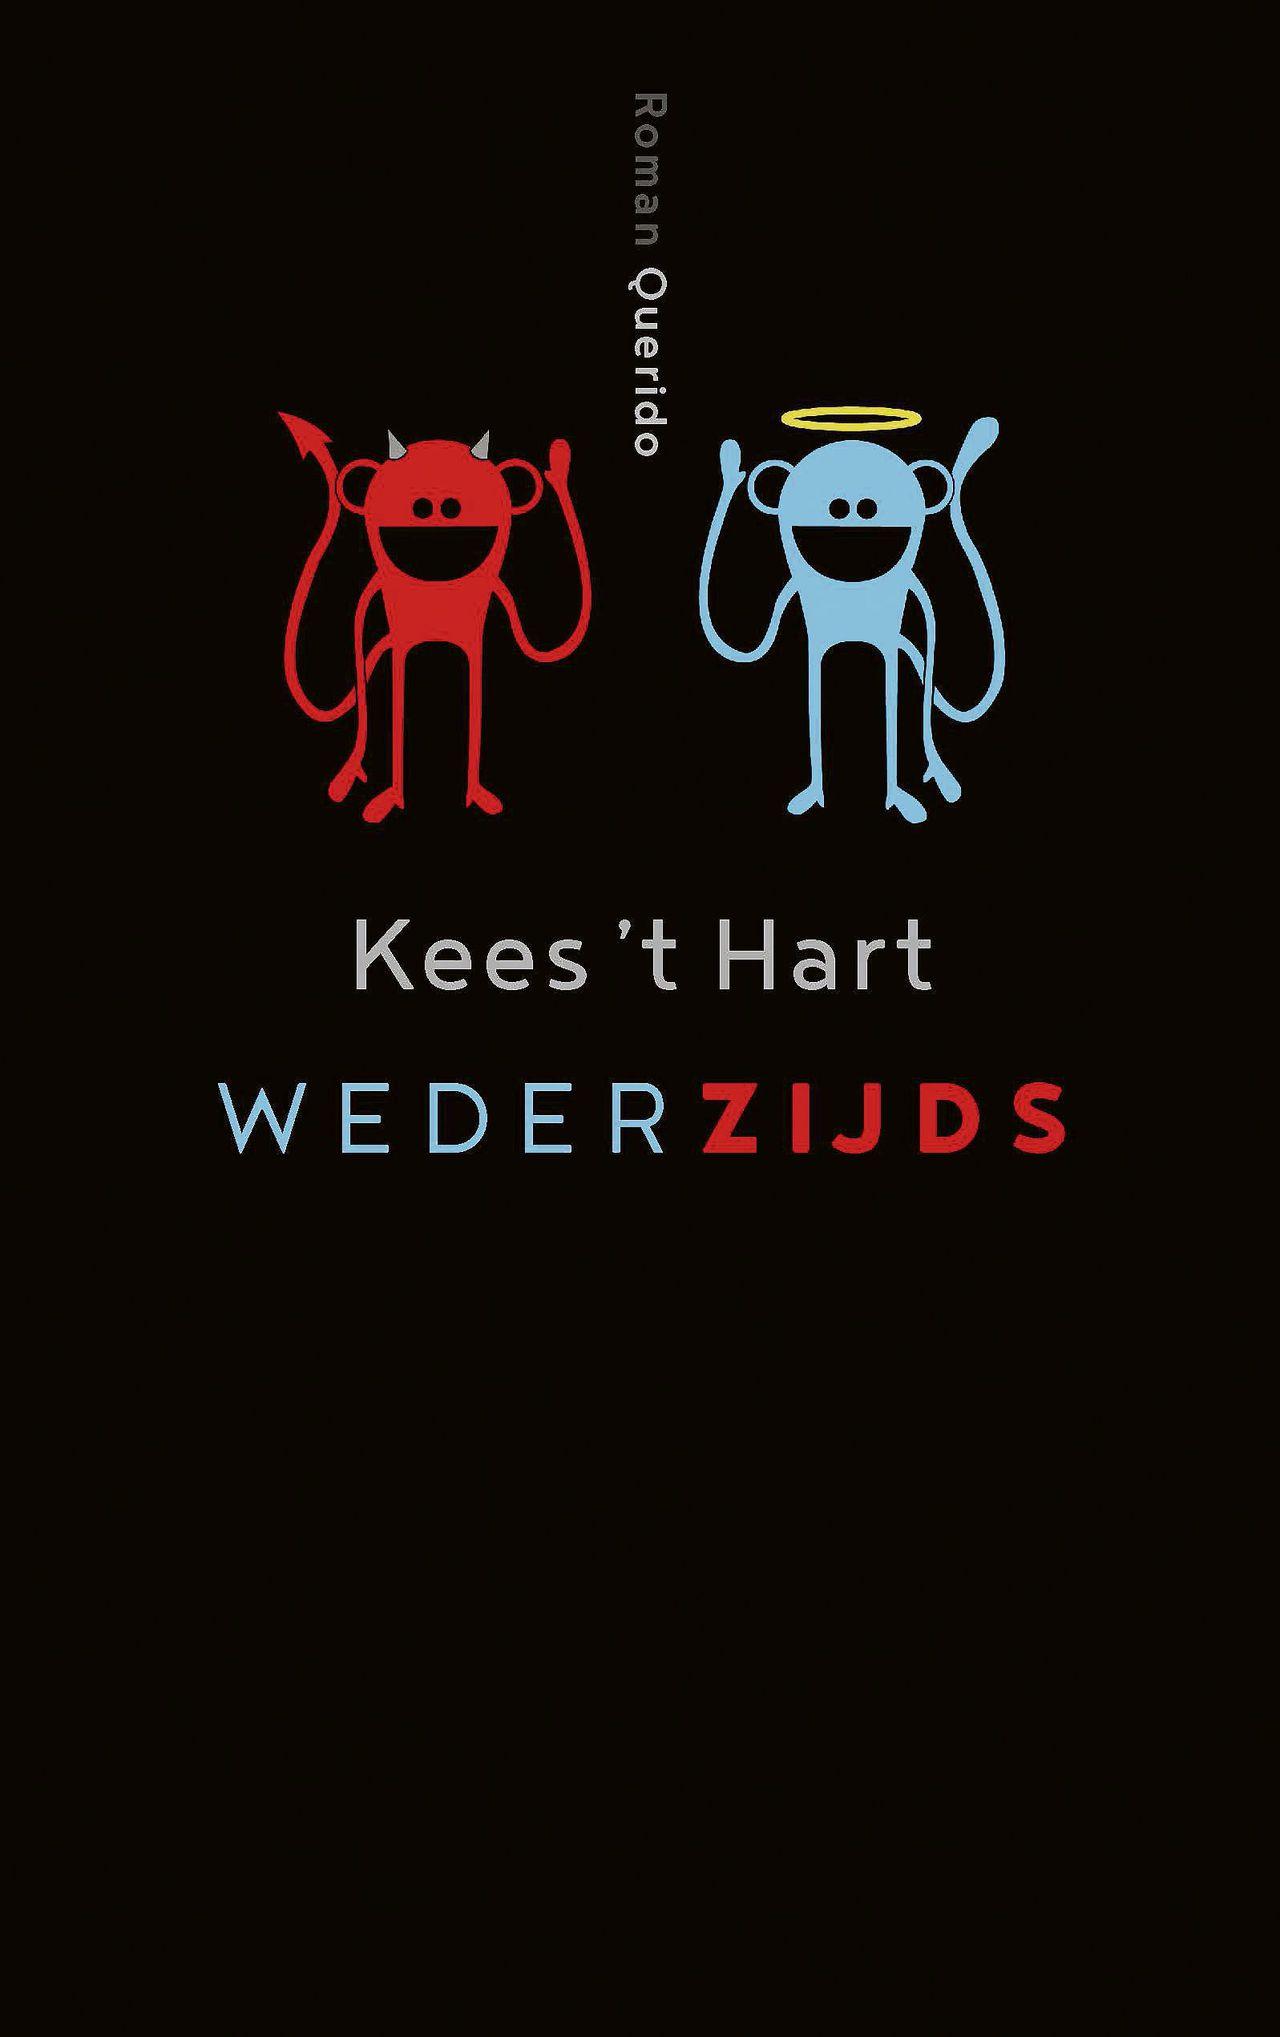 https://pratenoverromanfragmenten.nl/wp-content/uploads/2017/06/cover-1-Kees-t-Hart-Wederzijds.jpg